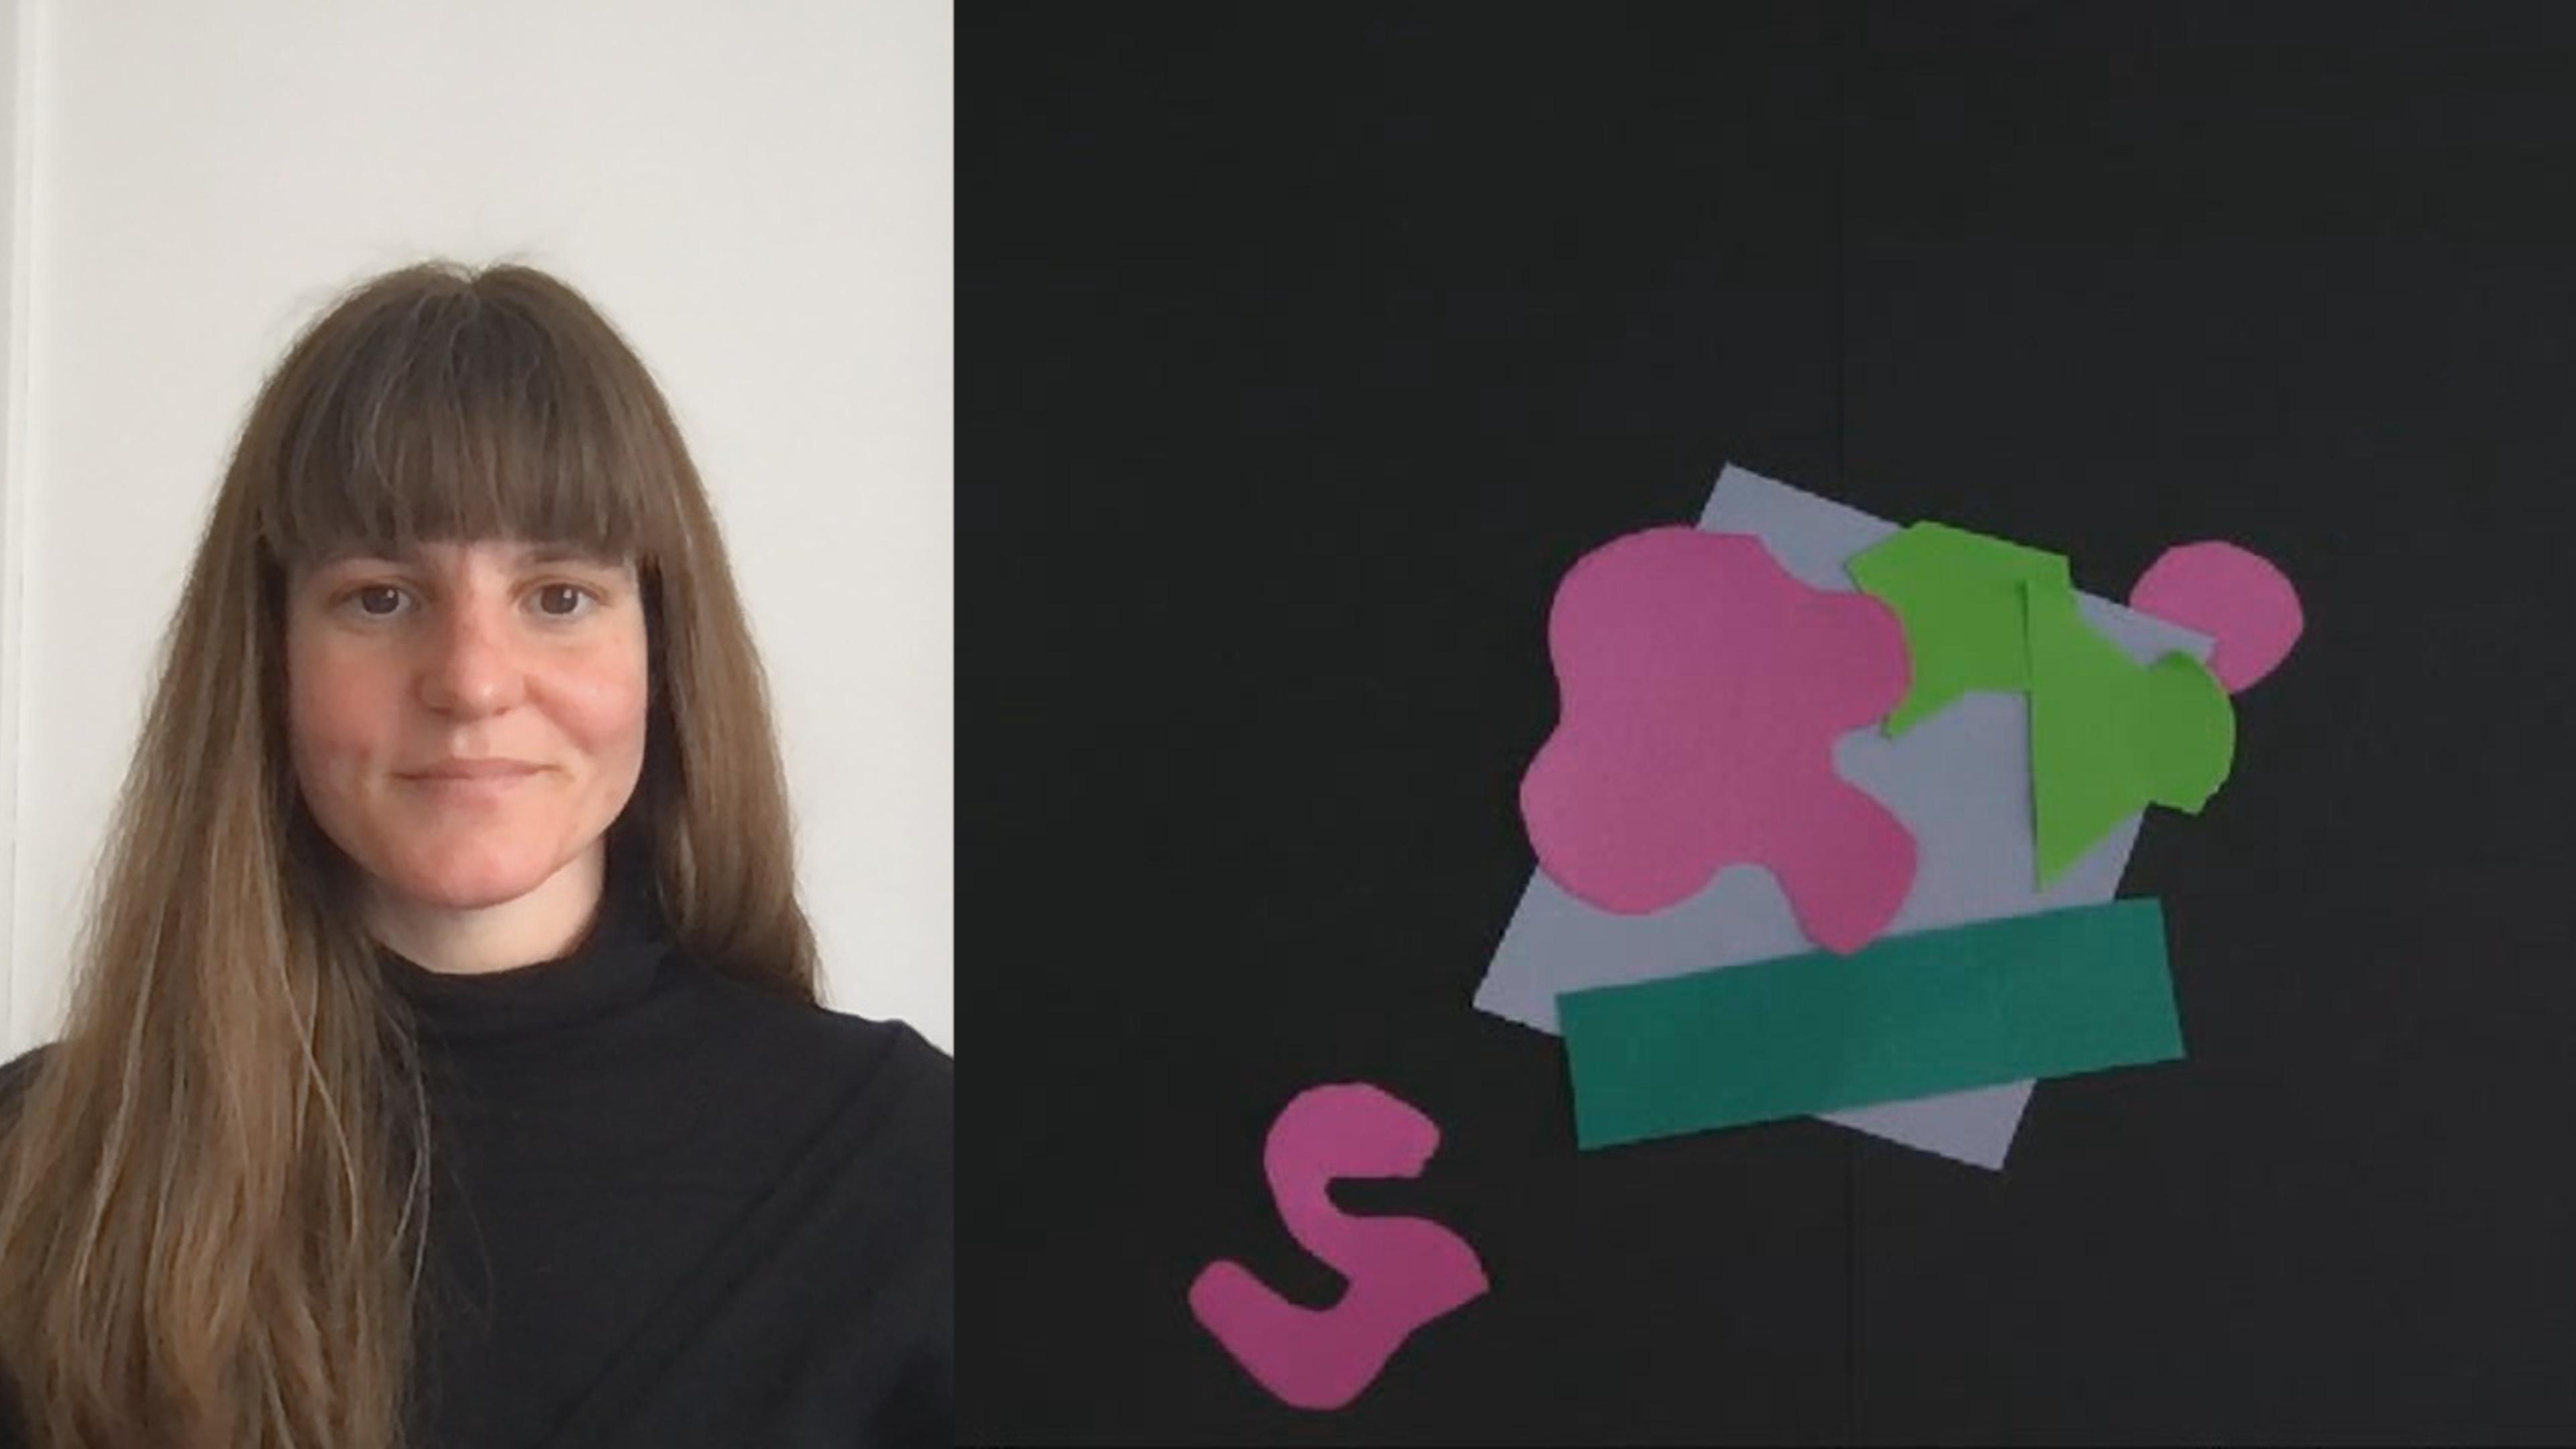 Explosives Chaos präsentiert von Verena Miedl-Faißt